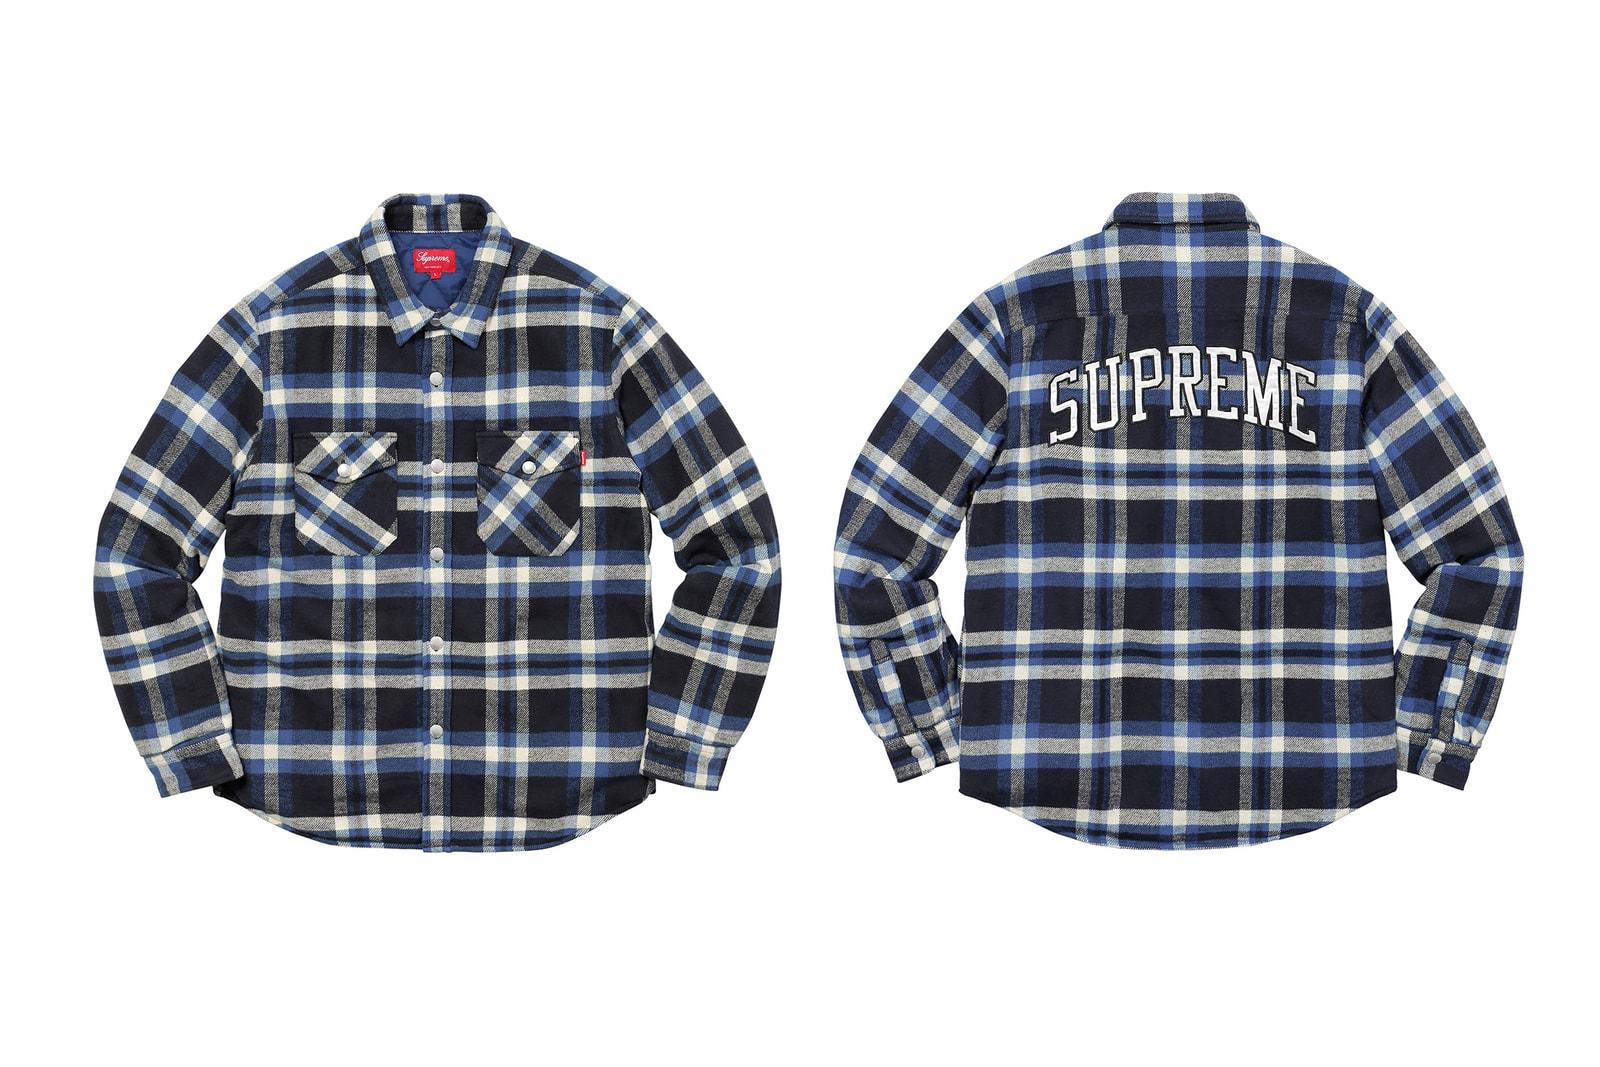 Supreme 2017 Fall Winter Drop